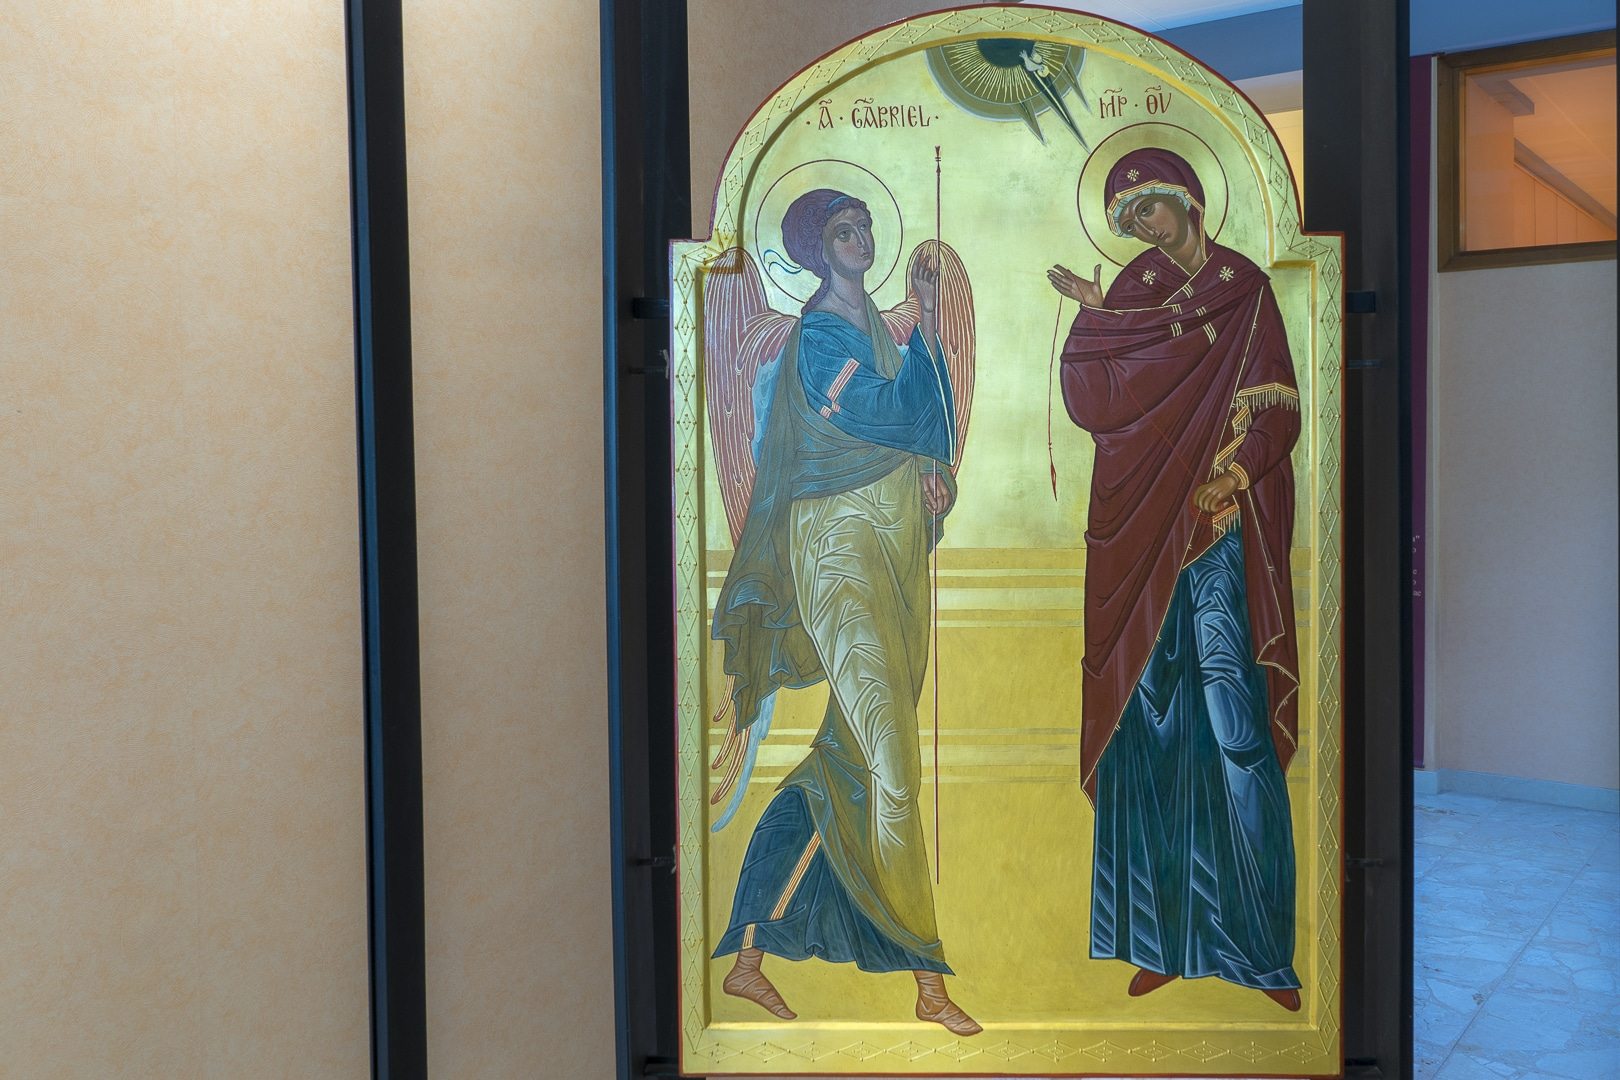 Atrio Annunciazione Mater Divinae Gratiae Brescia